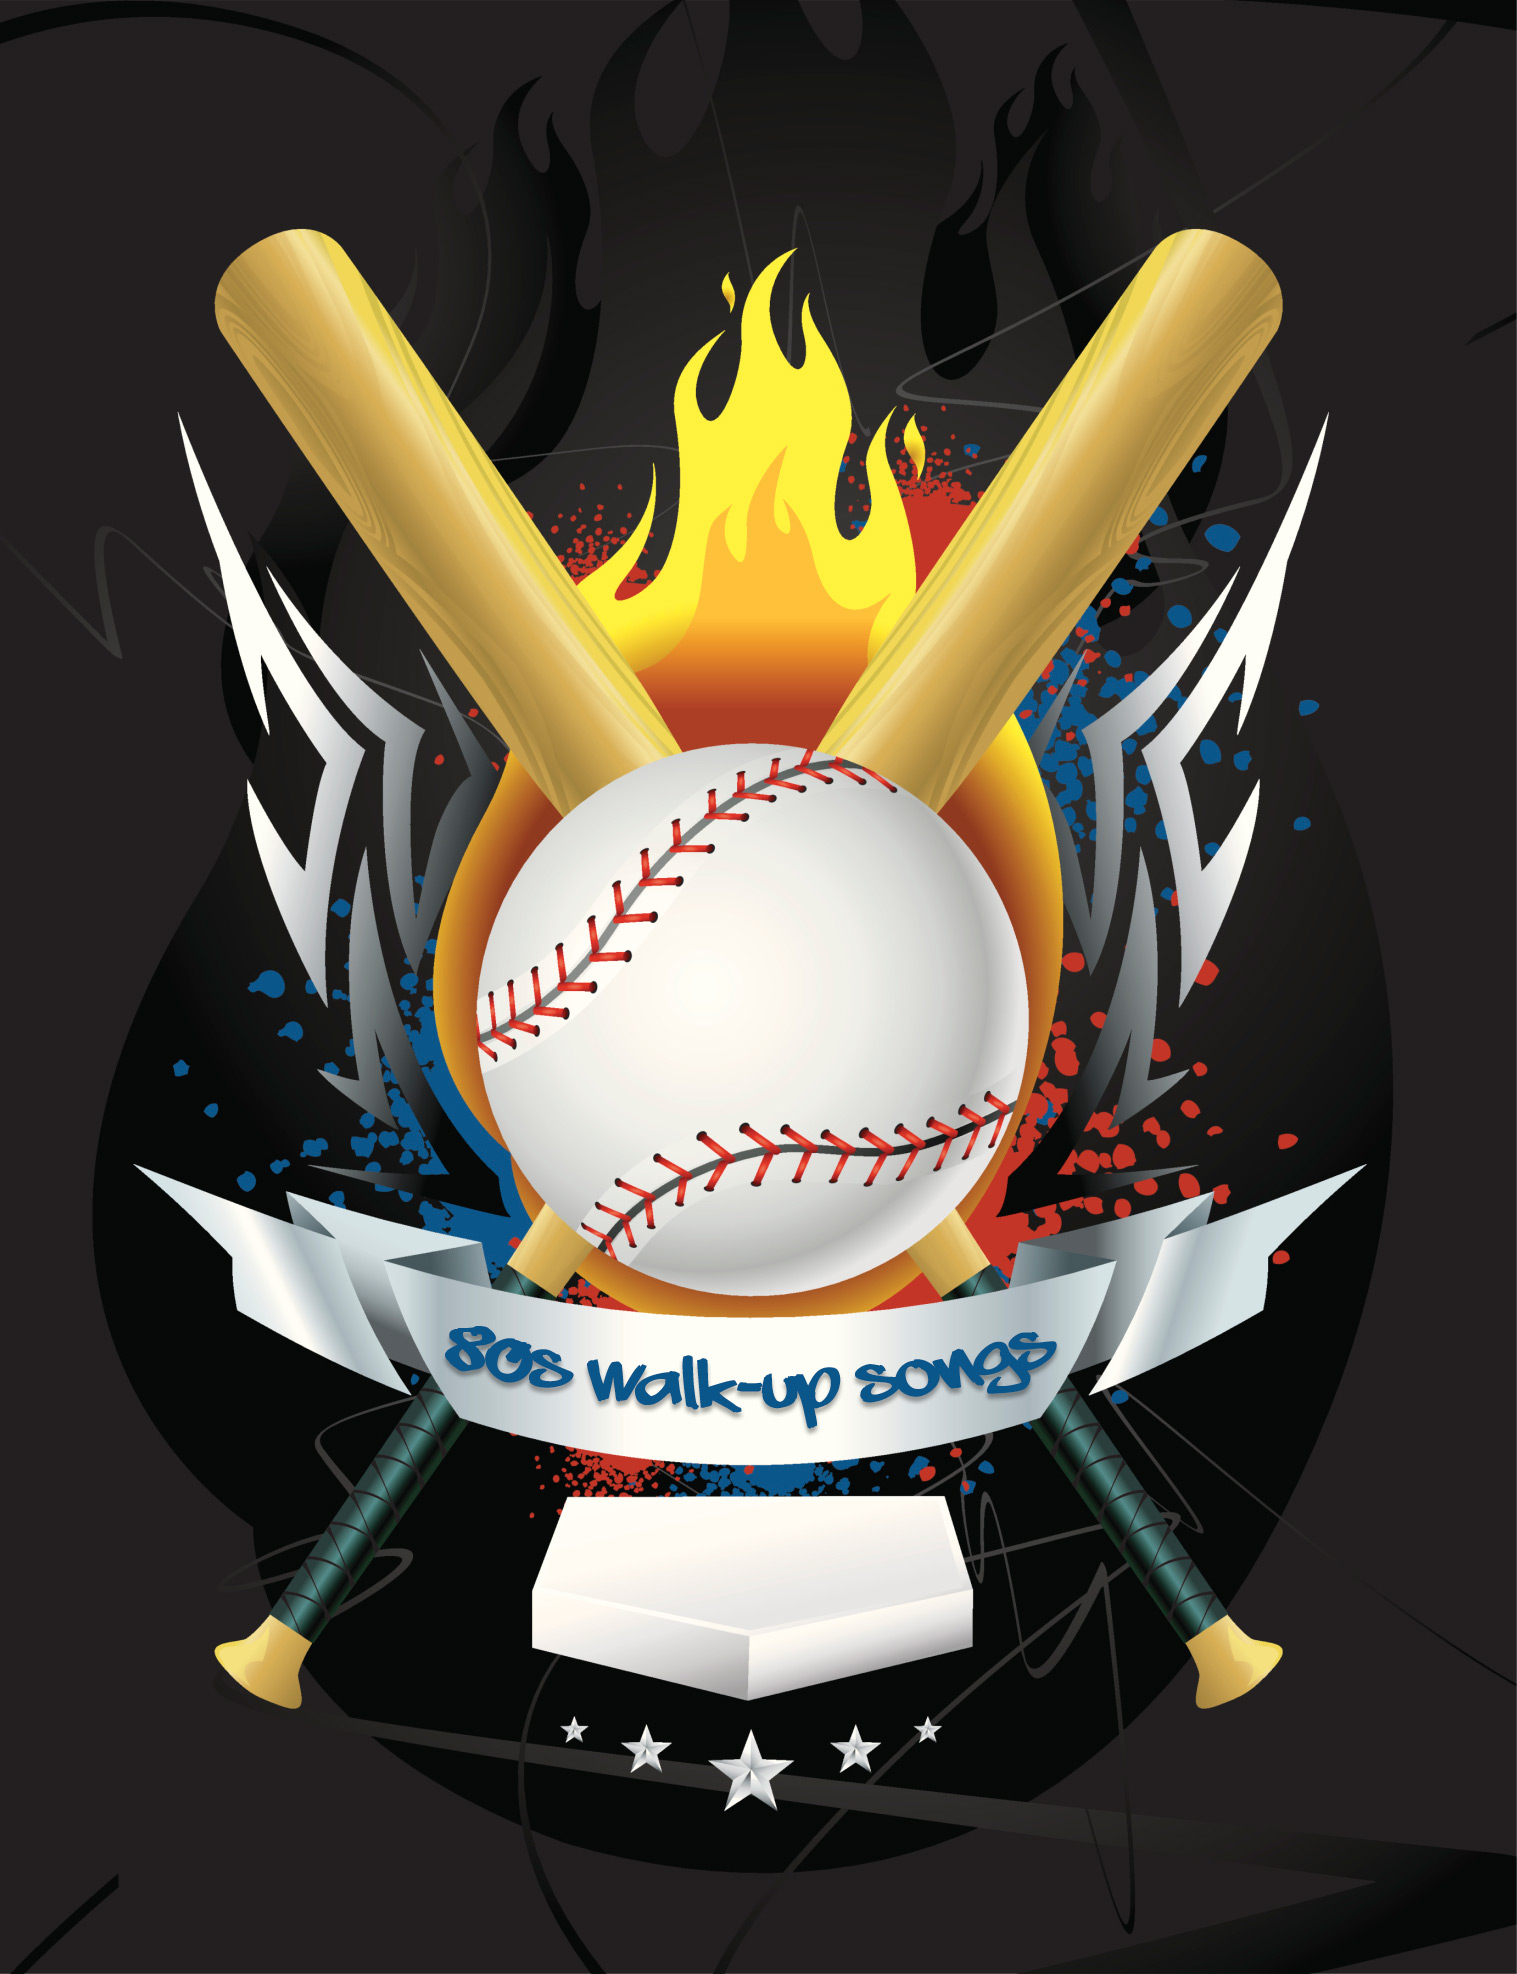 80s Walk-up Songs  in Major League Baseball